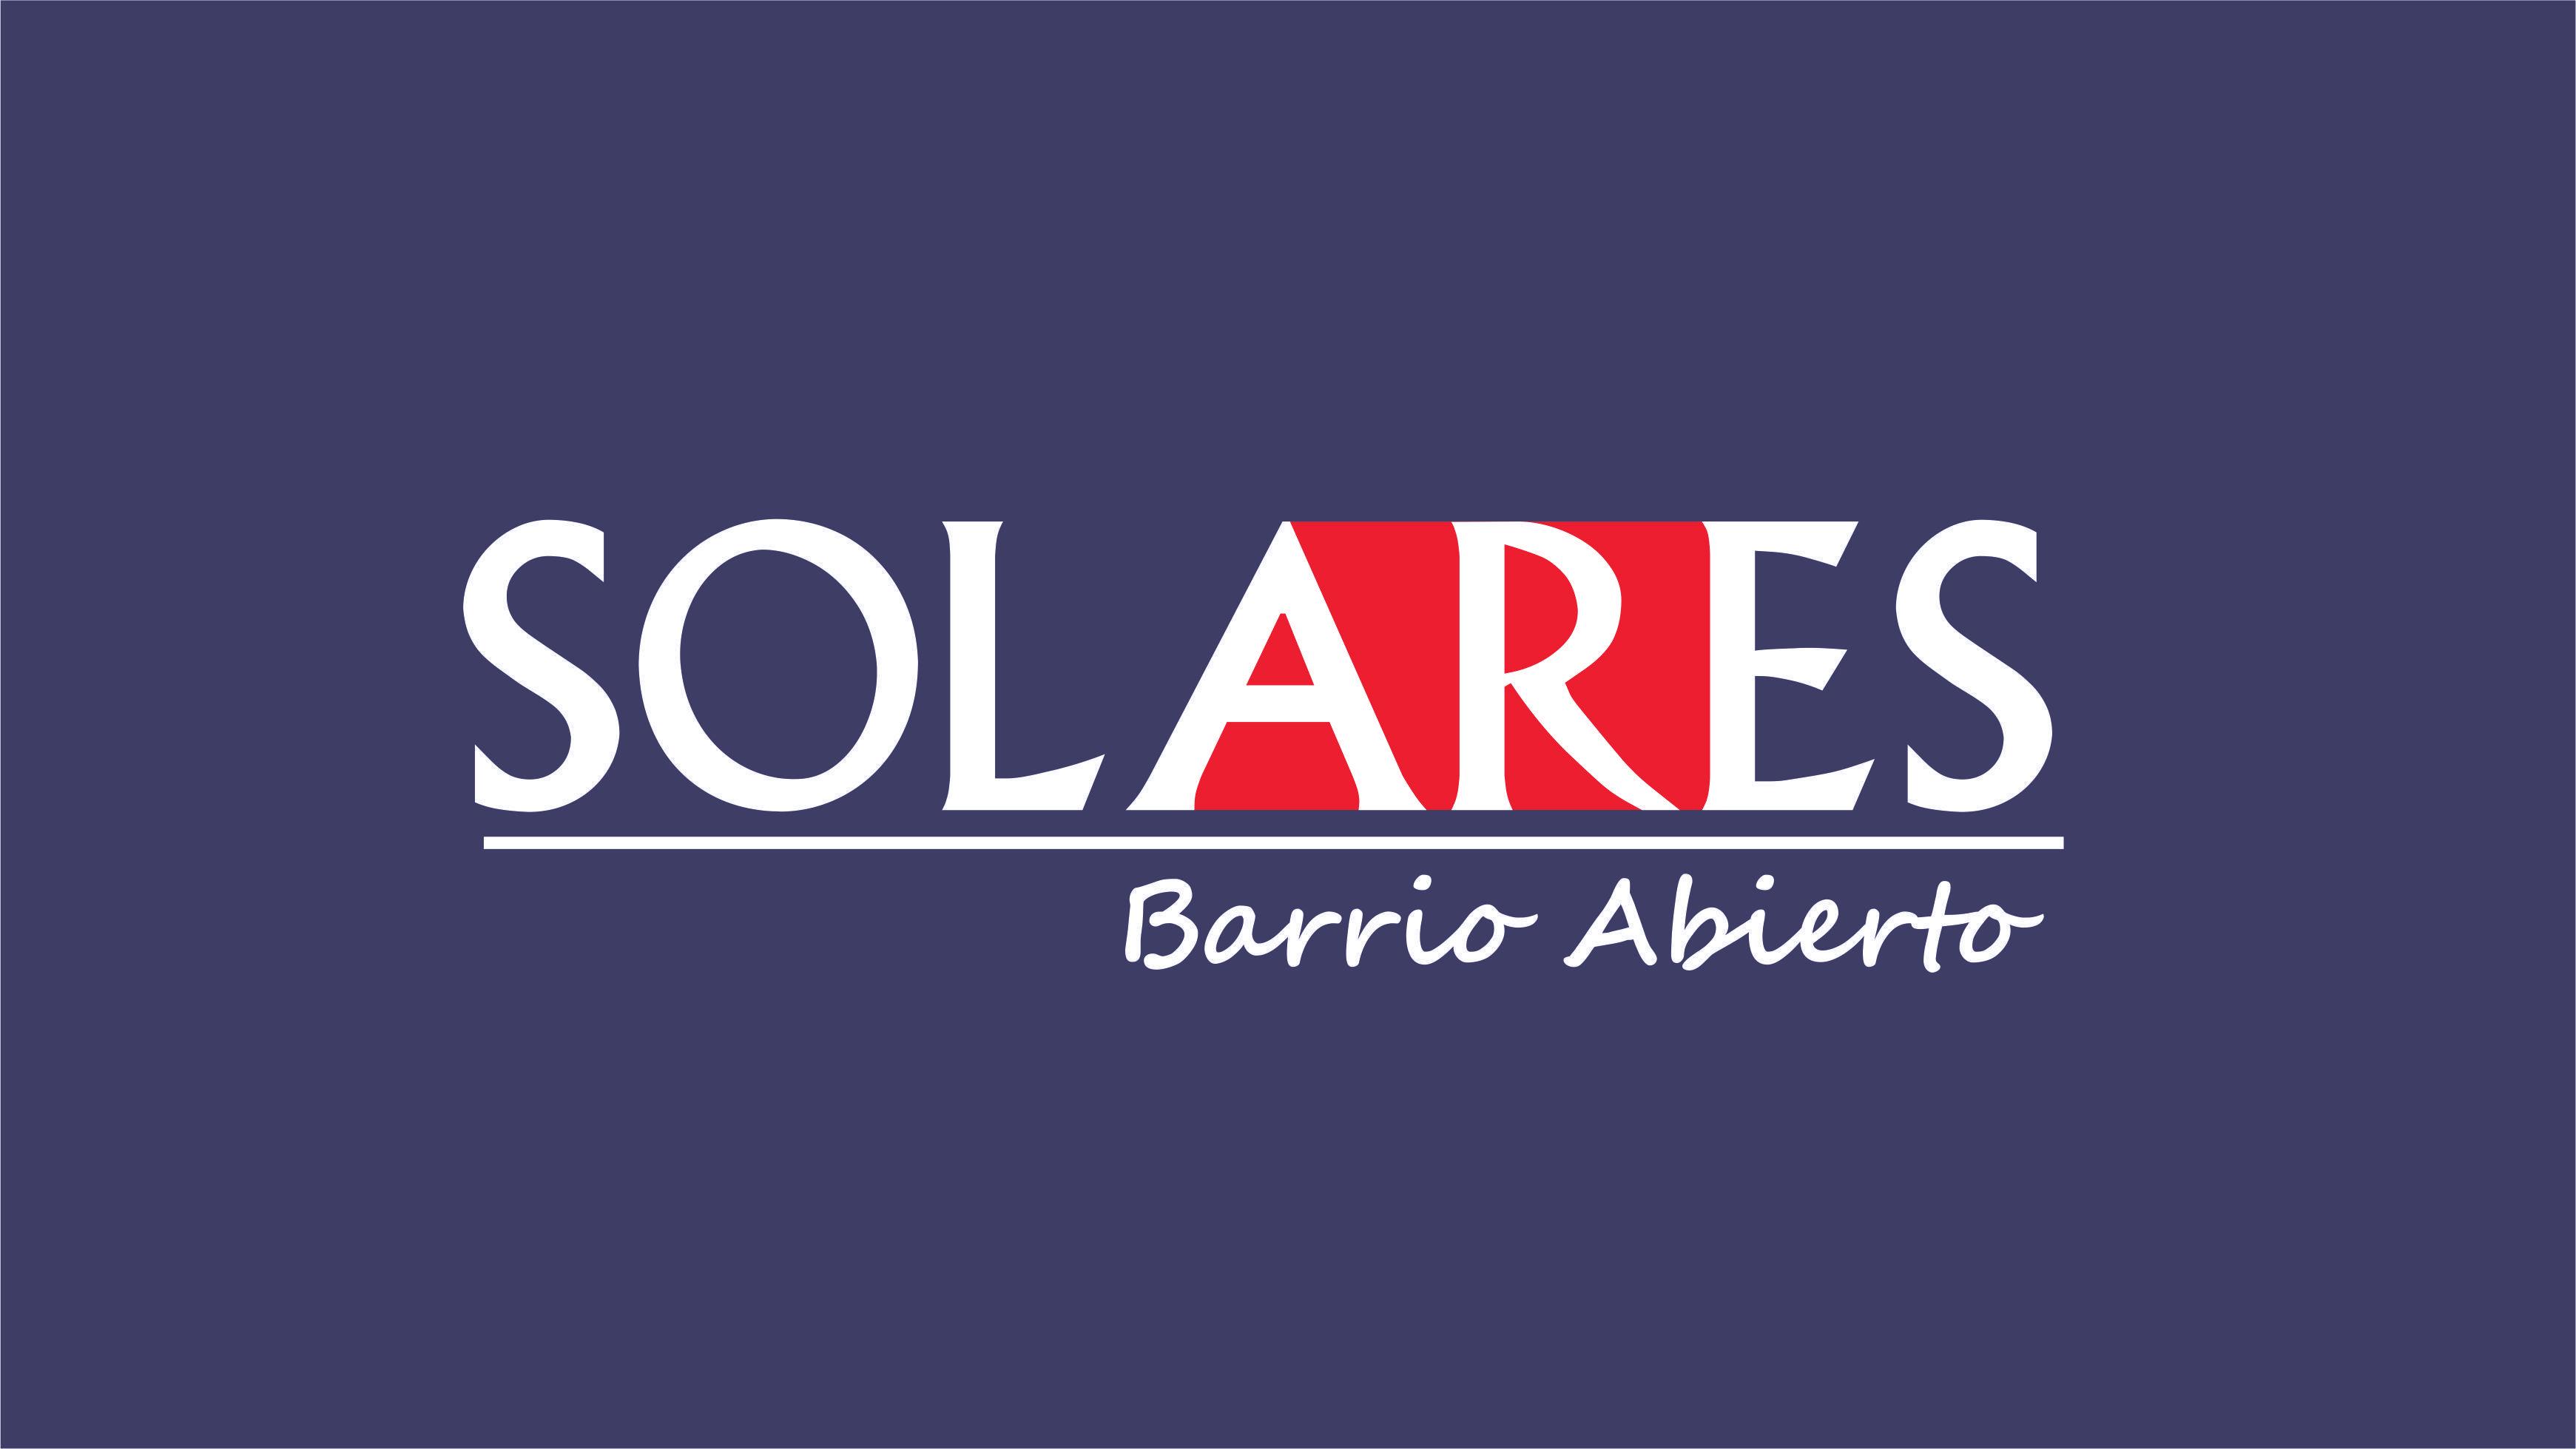 FotoEMPRENDIMIENTO - Barrio Abierto en  en  Merlo , Junin  Av Jose Mercau s/n